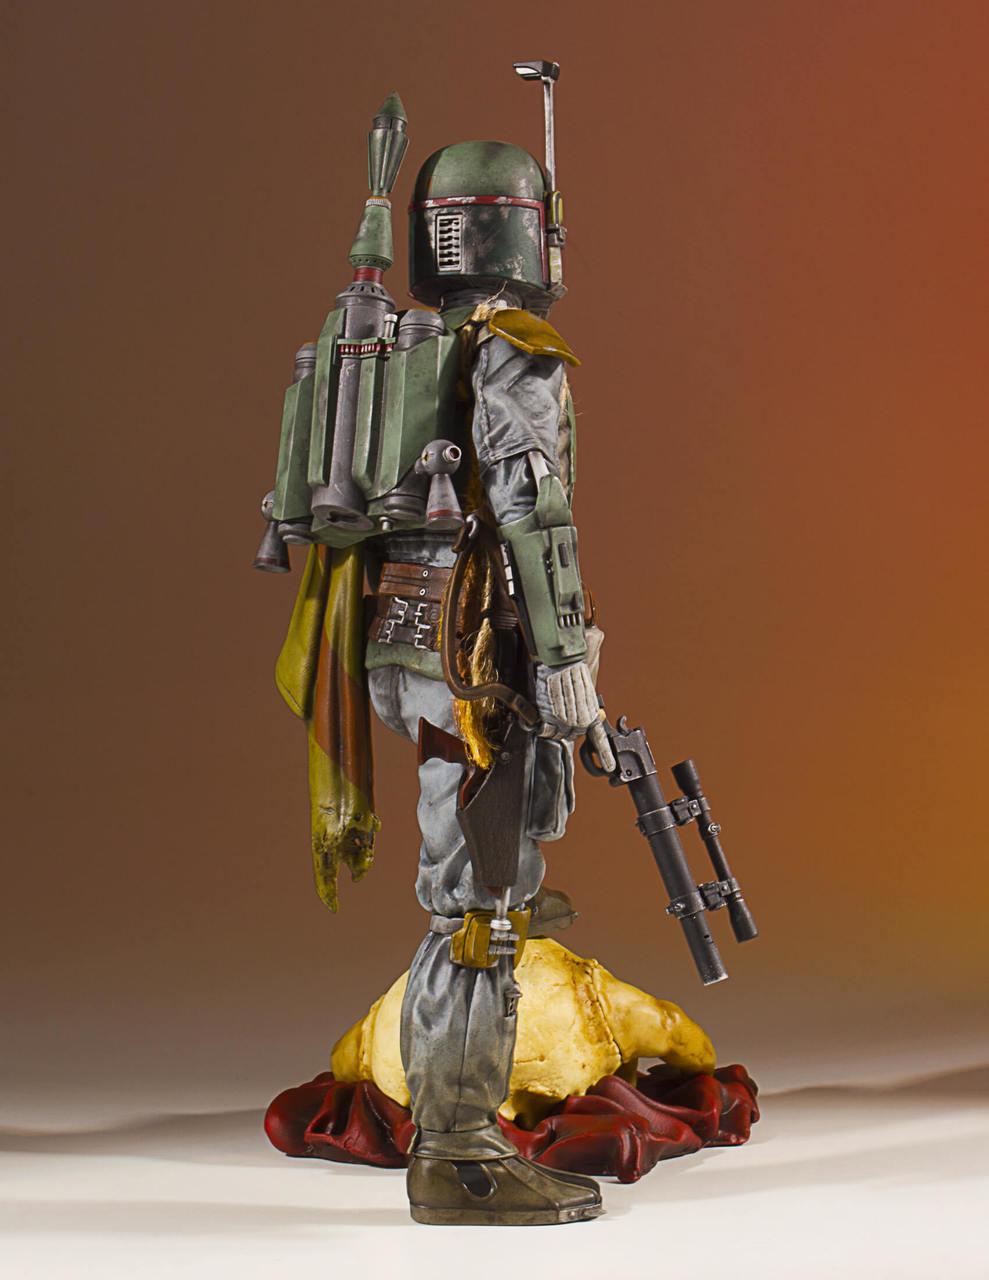 ROTJ GGLTD Boba Fett Statue 5